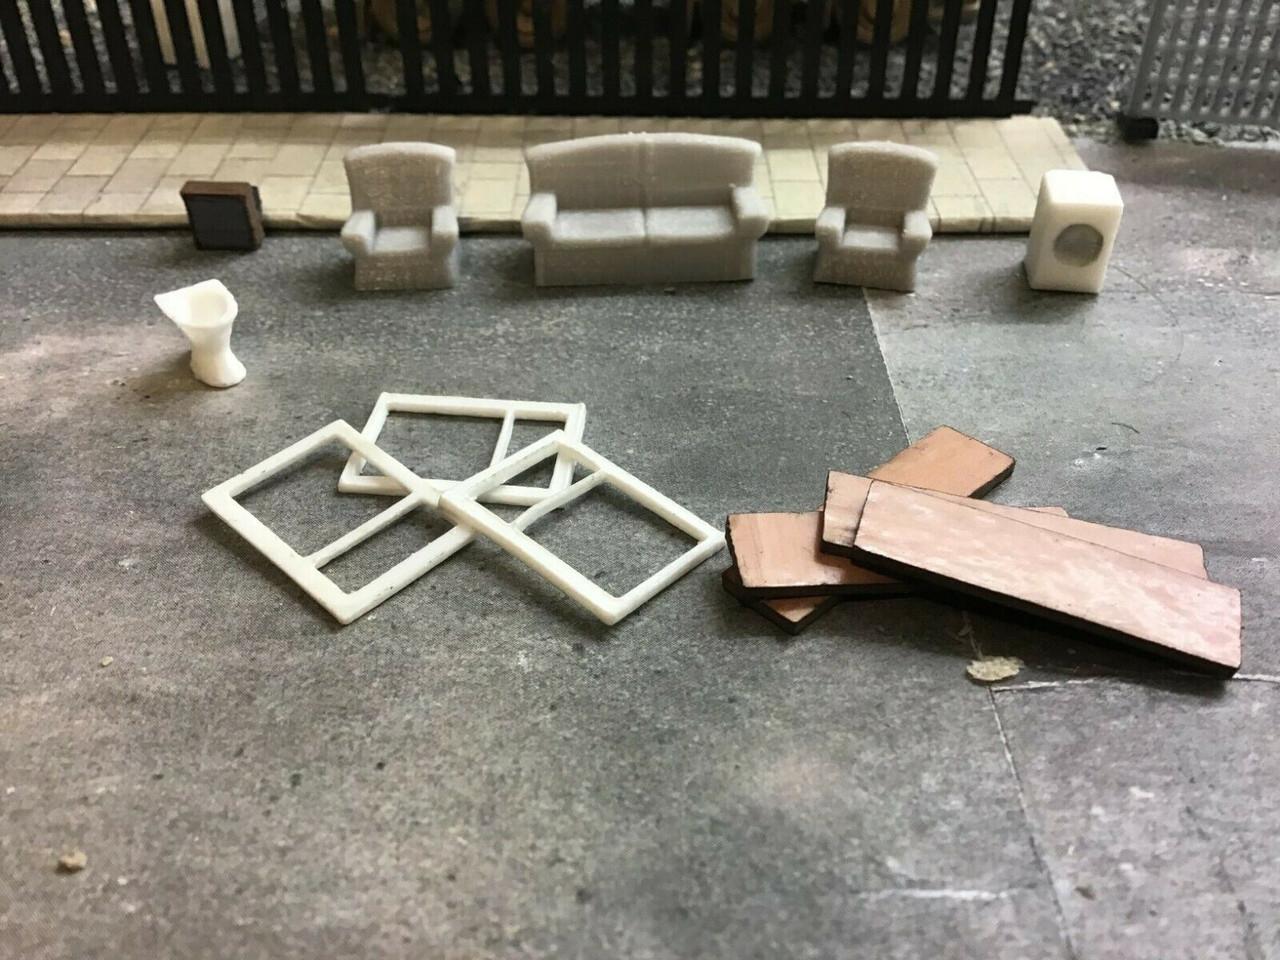 Lineside / Trackside Junk in OO Gauge / 1:76 scale